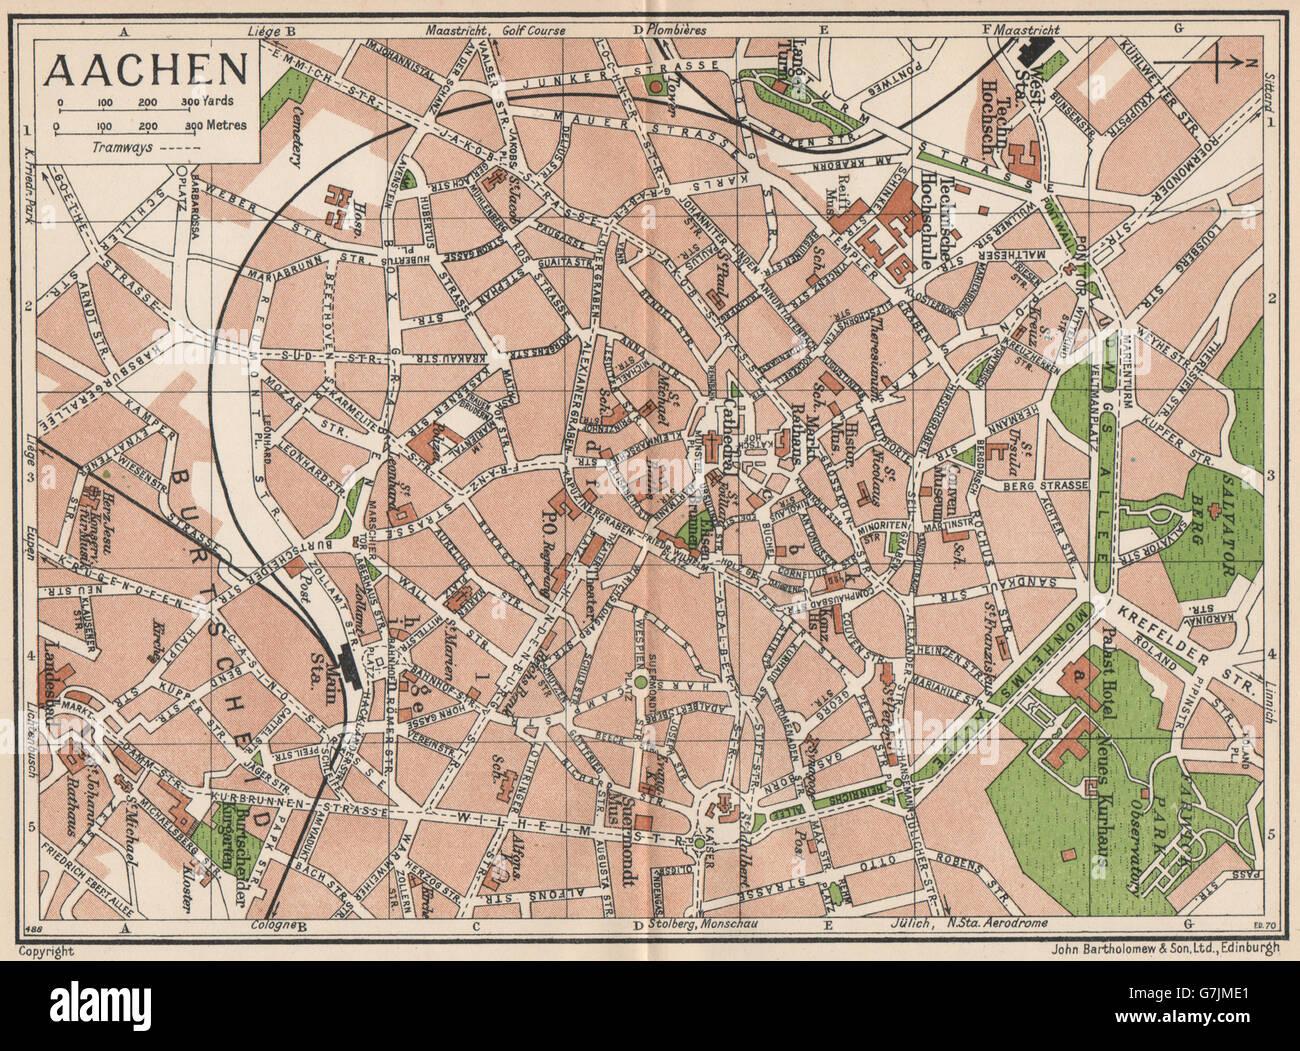 Map Of Germany Stockfotos und  bilder Kaufen   Alamy